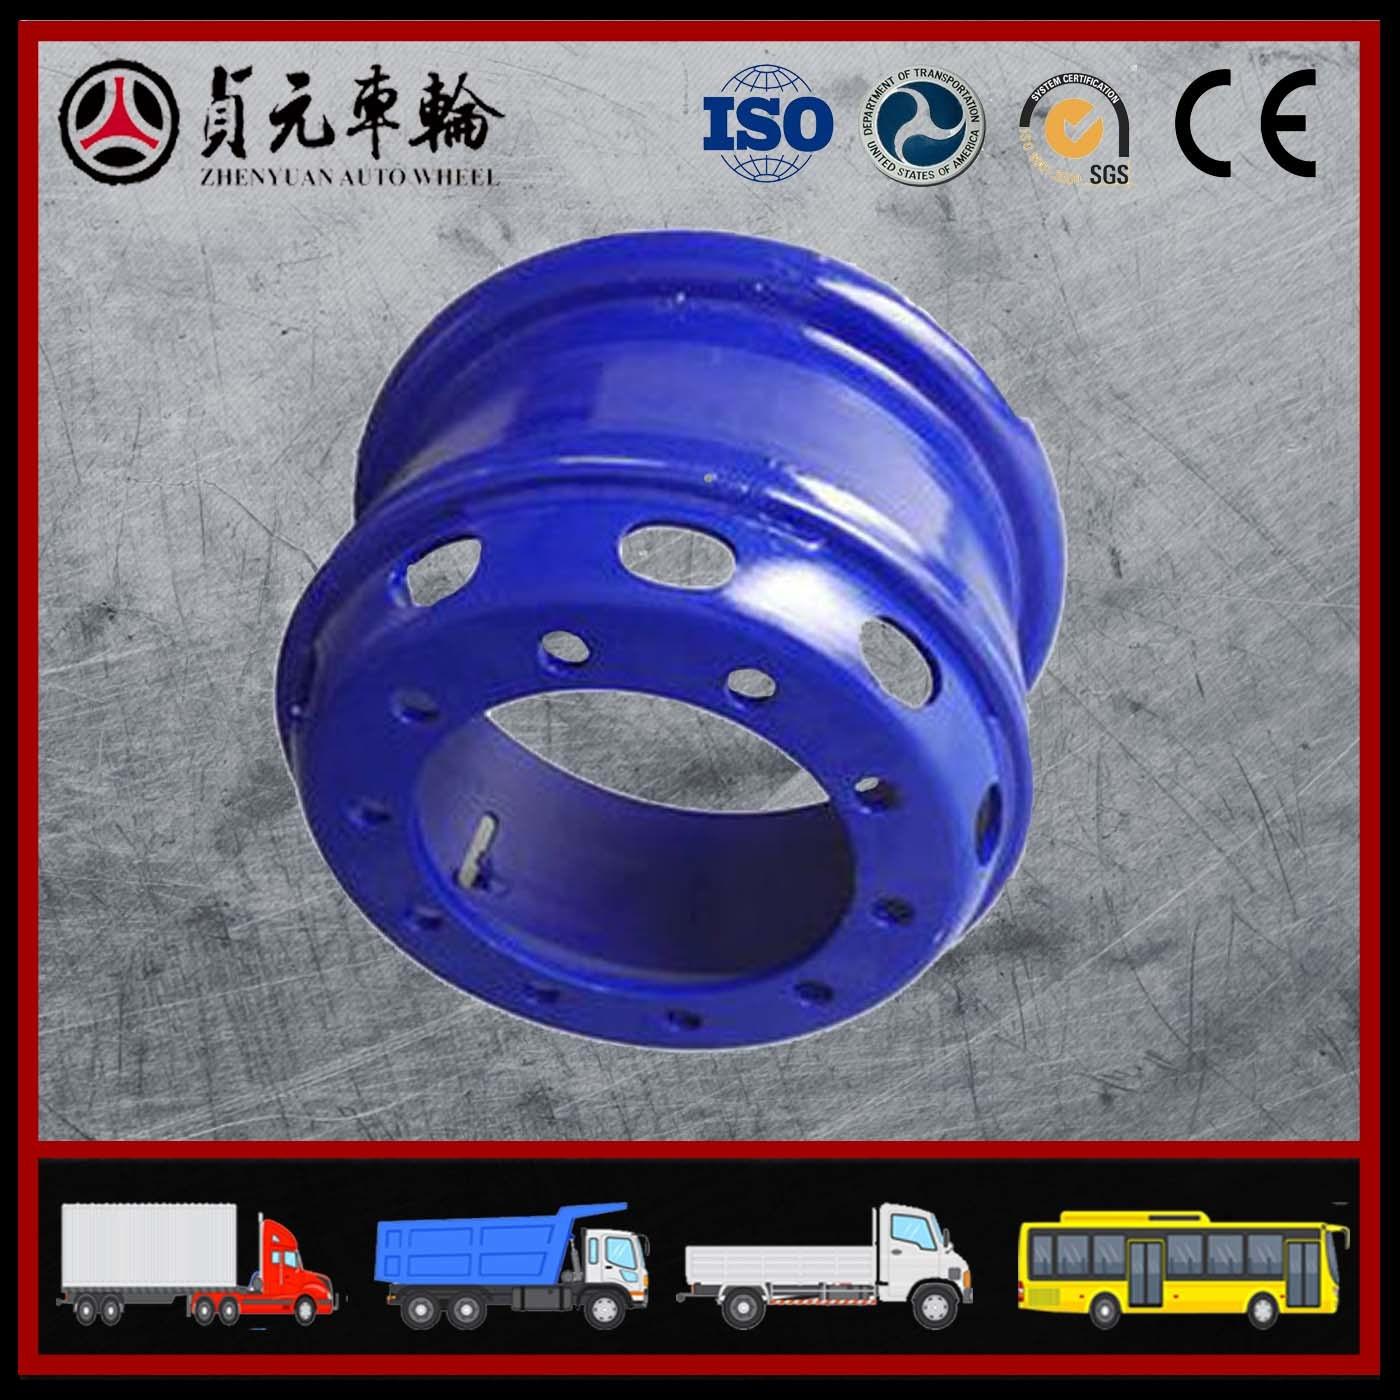 Manufacturer Zhenyuan Wheel FAW-Supply Steel Wheel